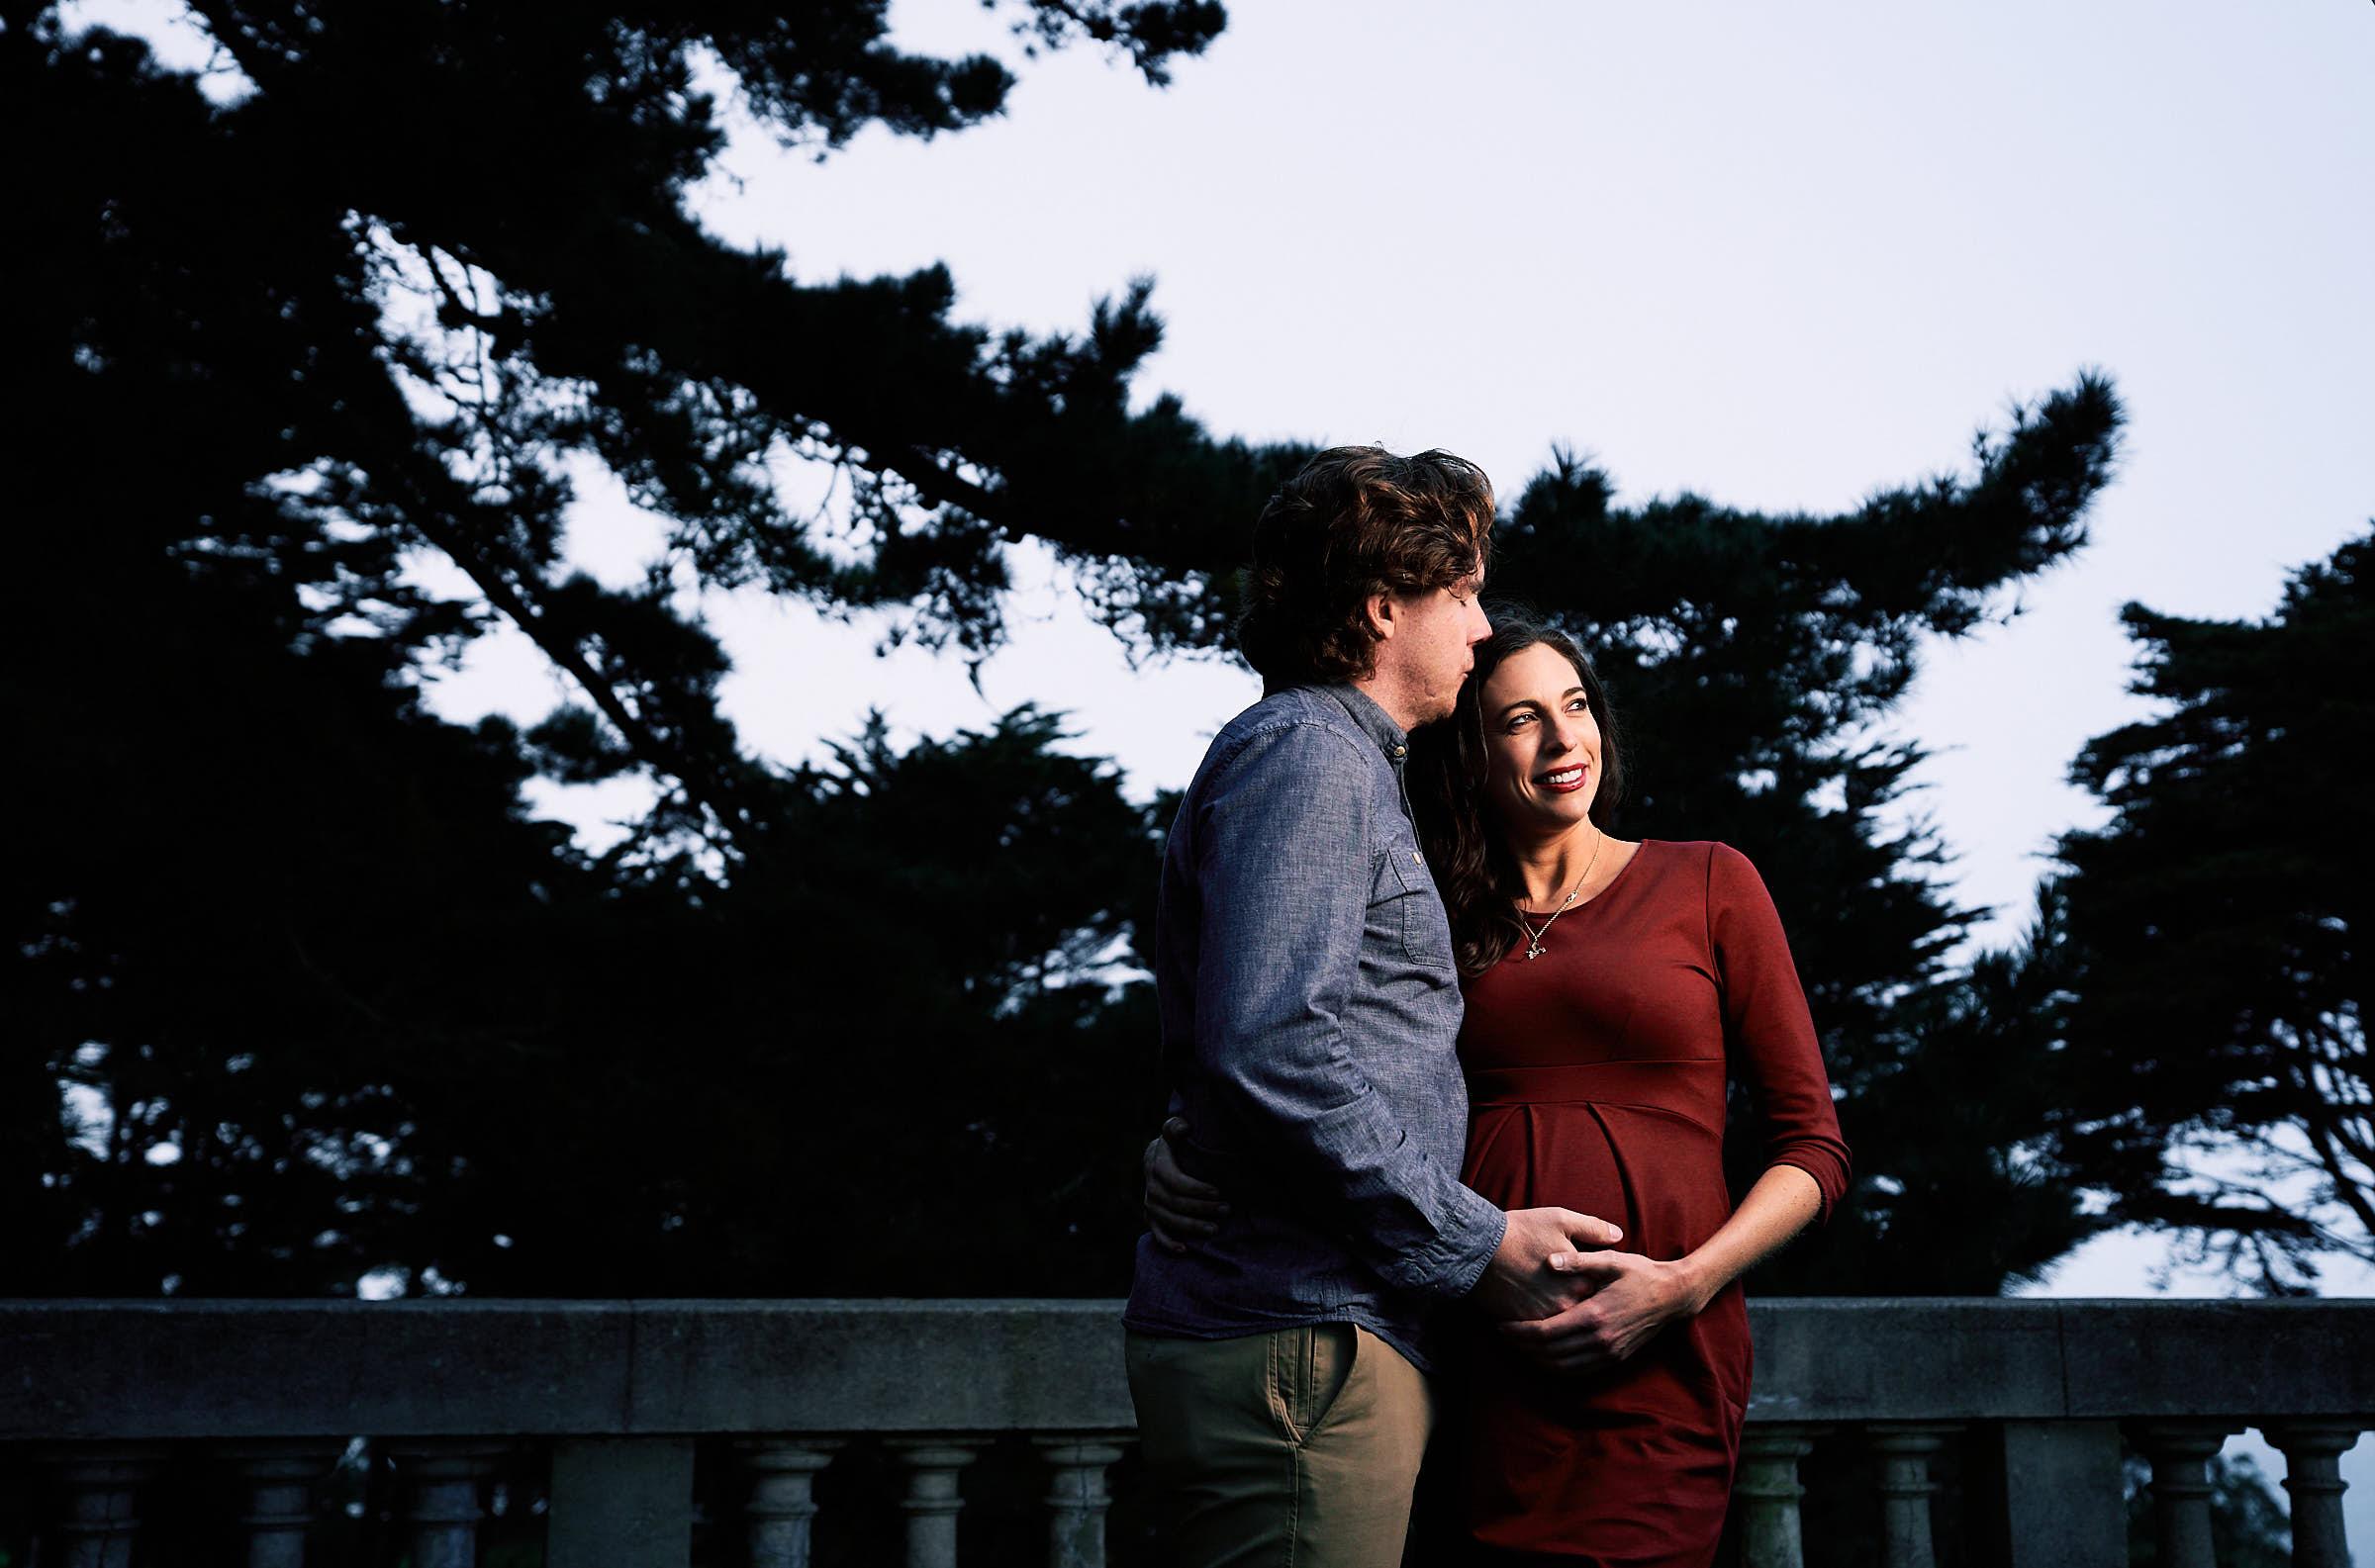 San Francisco Baby Moon Photographer Afewgoodclicks